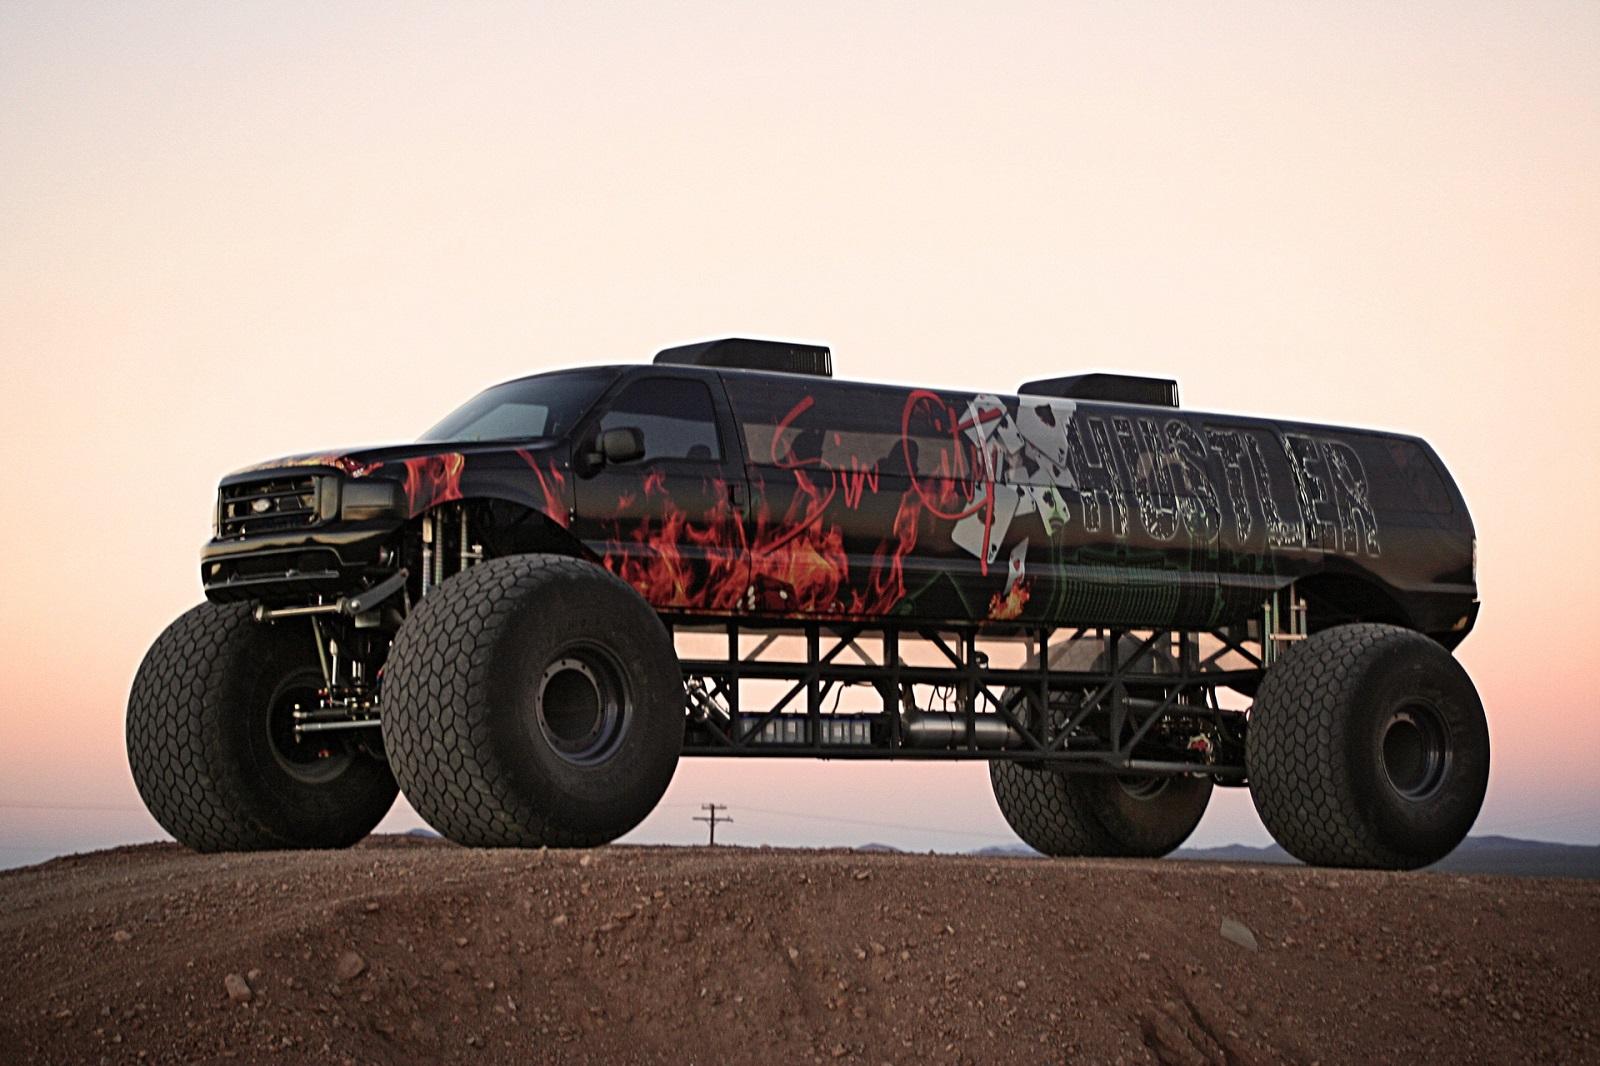 4Runner Trd Off Road >> 'Sin City Hustler' Is A $1M Ford Excursion Monster Truck ...